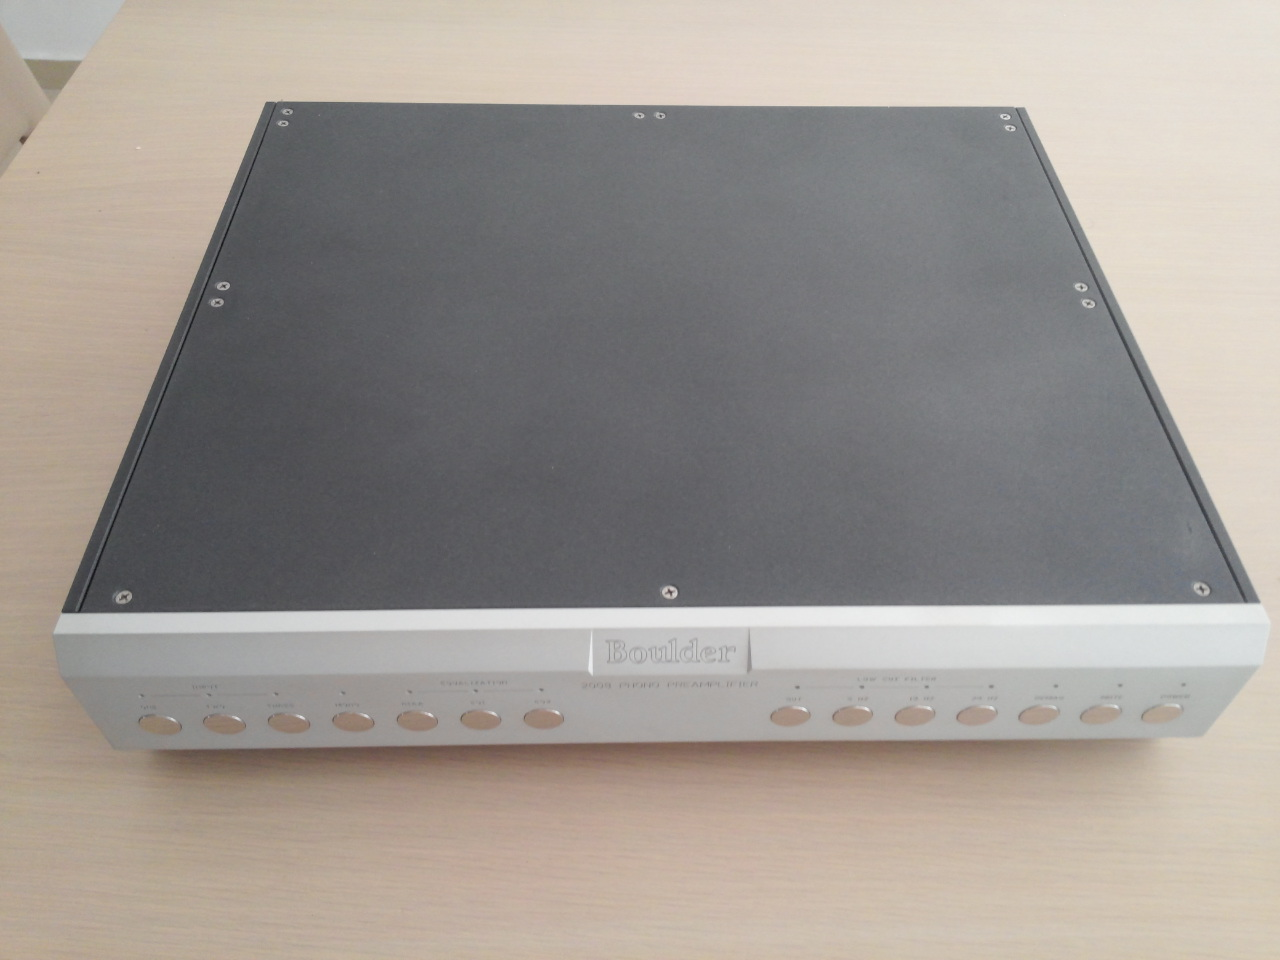 Boulder Amplifiers 2008 Phono Preamplifier  GBP 5,700.00 1495rms